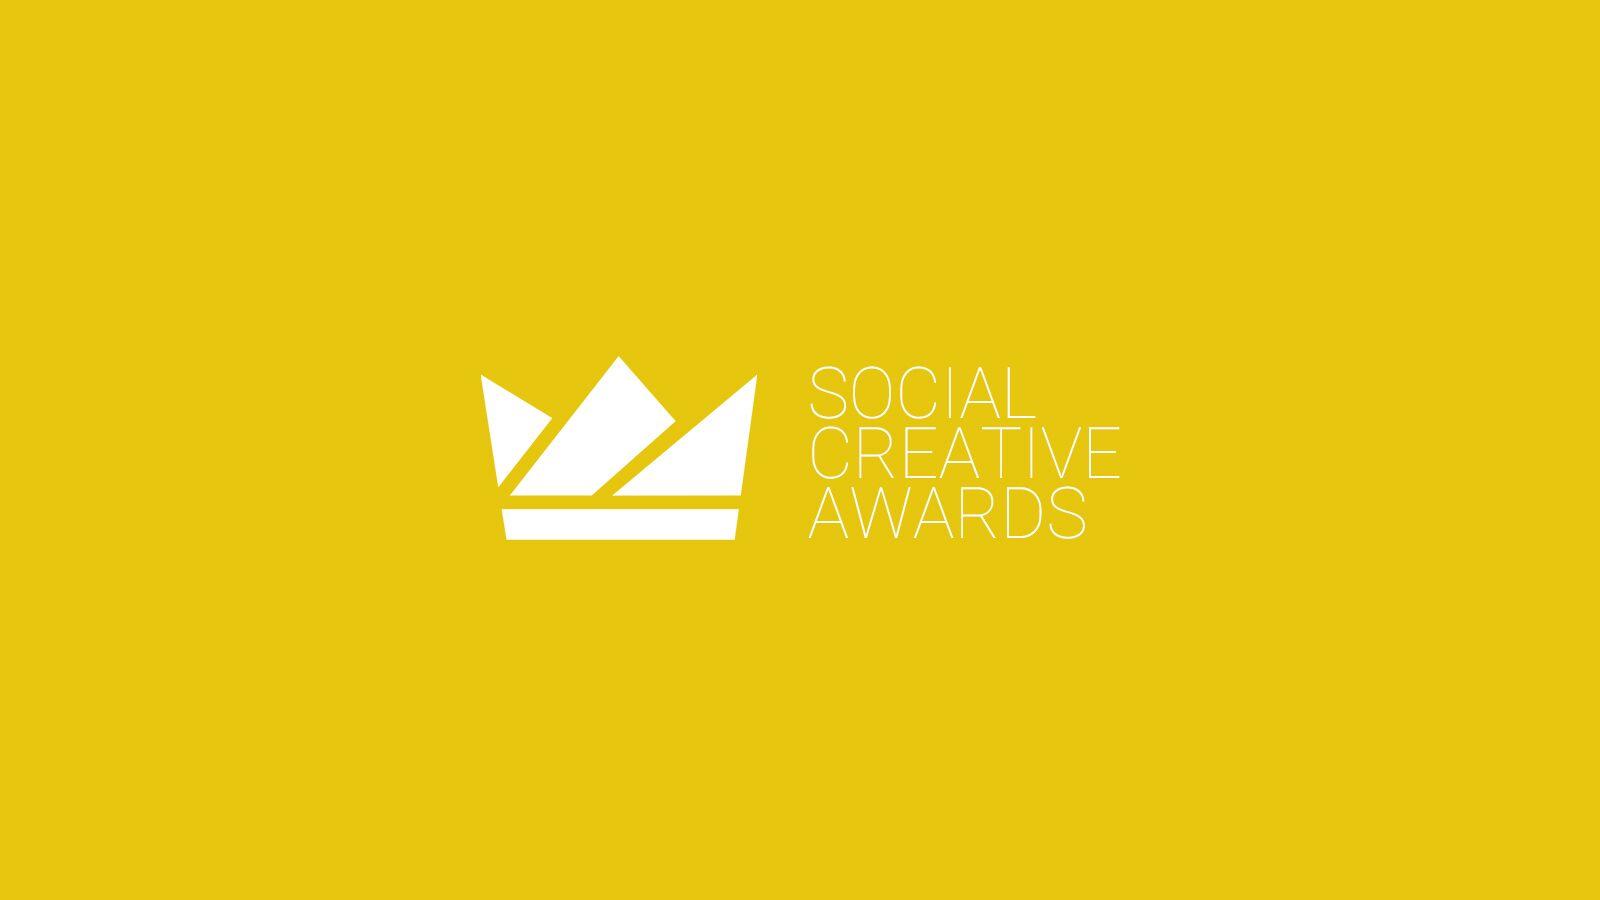 In arrivo i Social Creative Awards, i premi dedicati ai migliori post sui Social Media